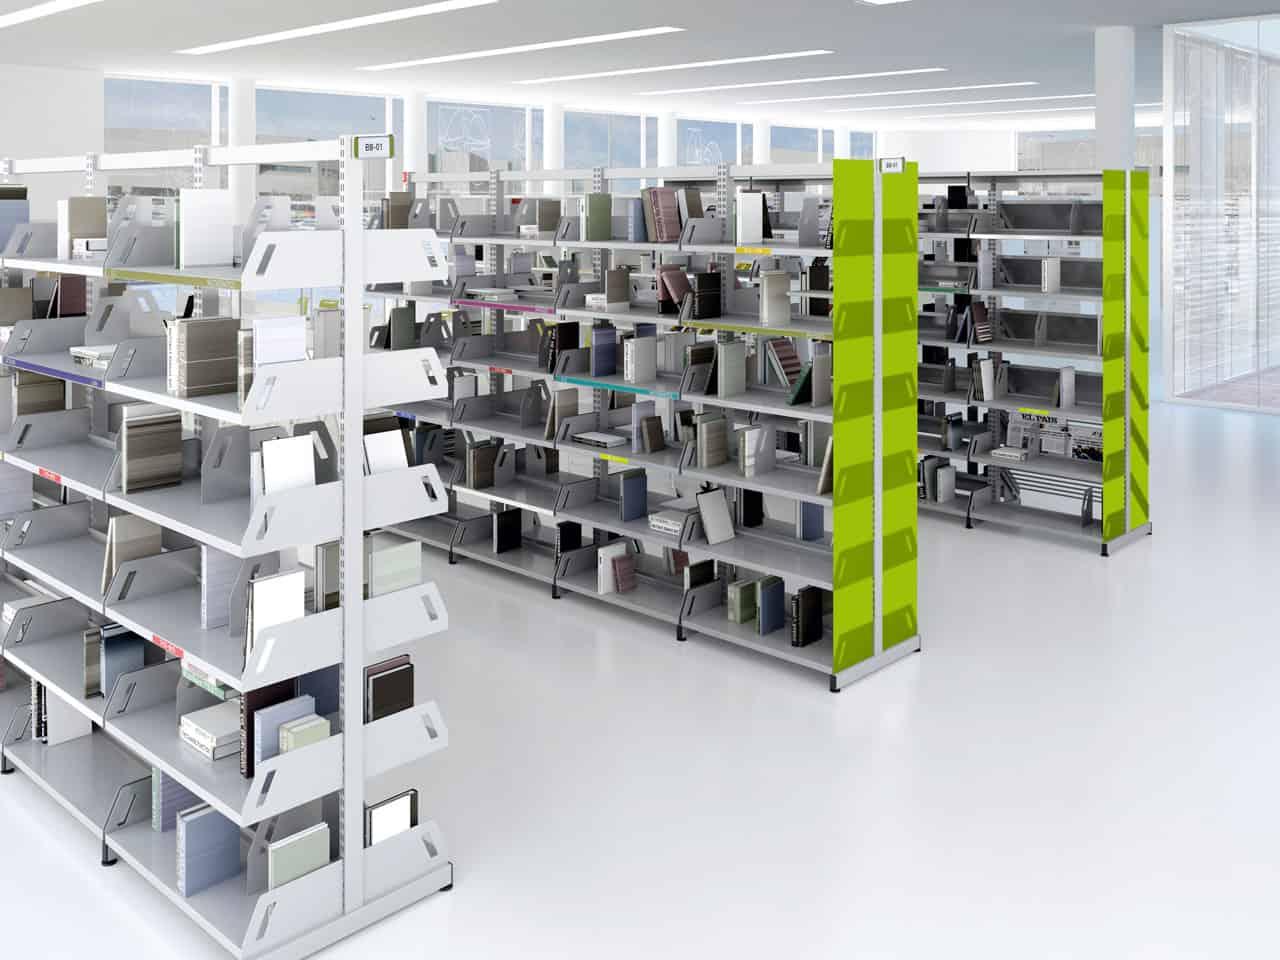 biblioteca-level-gallery-1_1280_1280